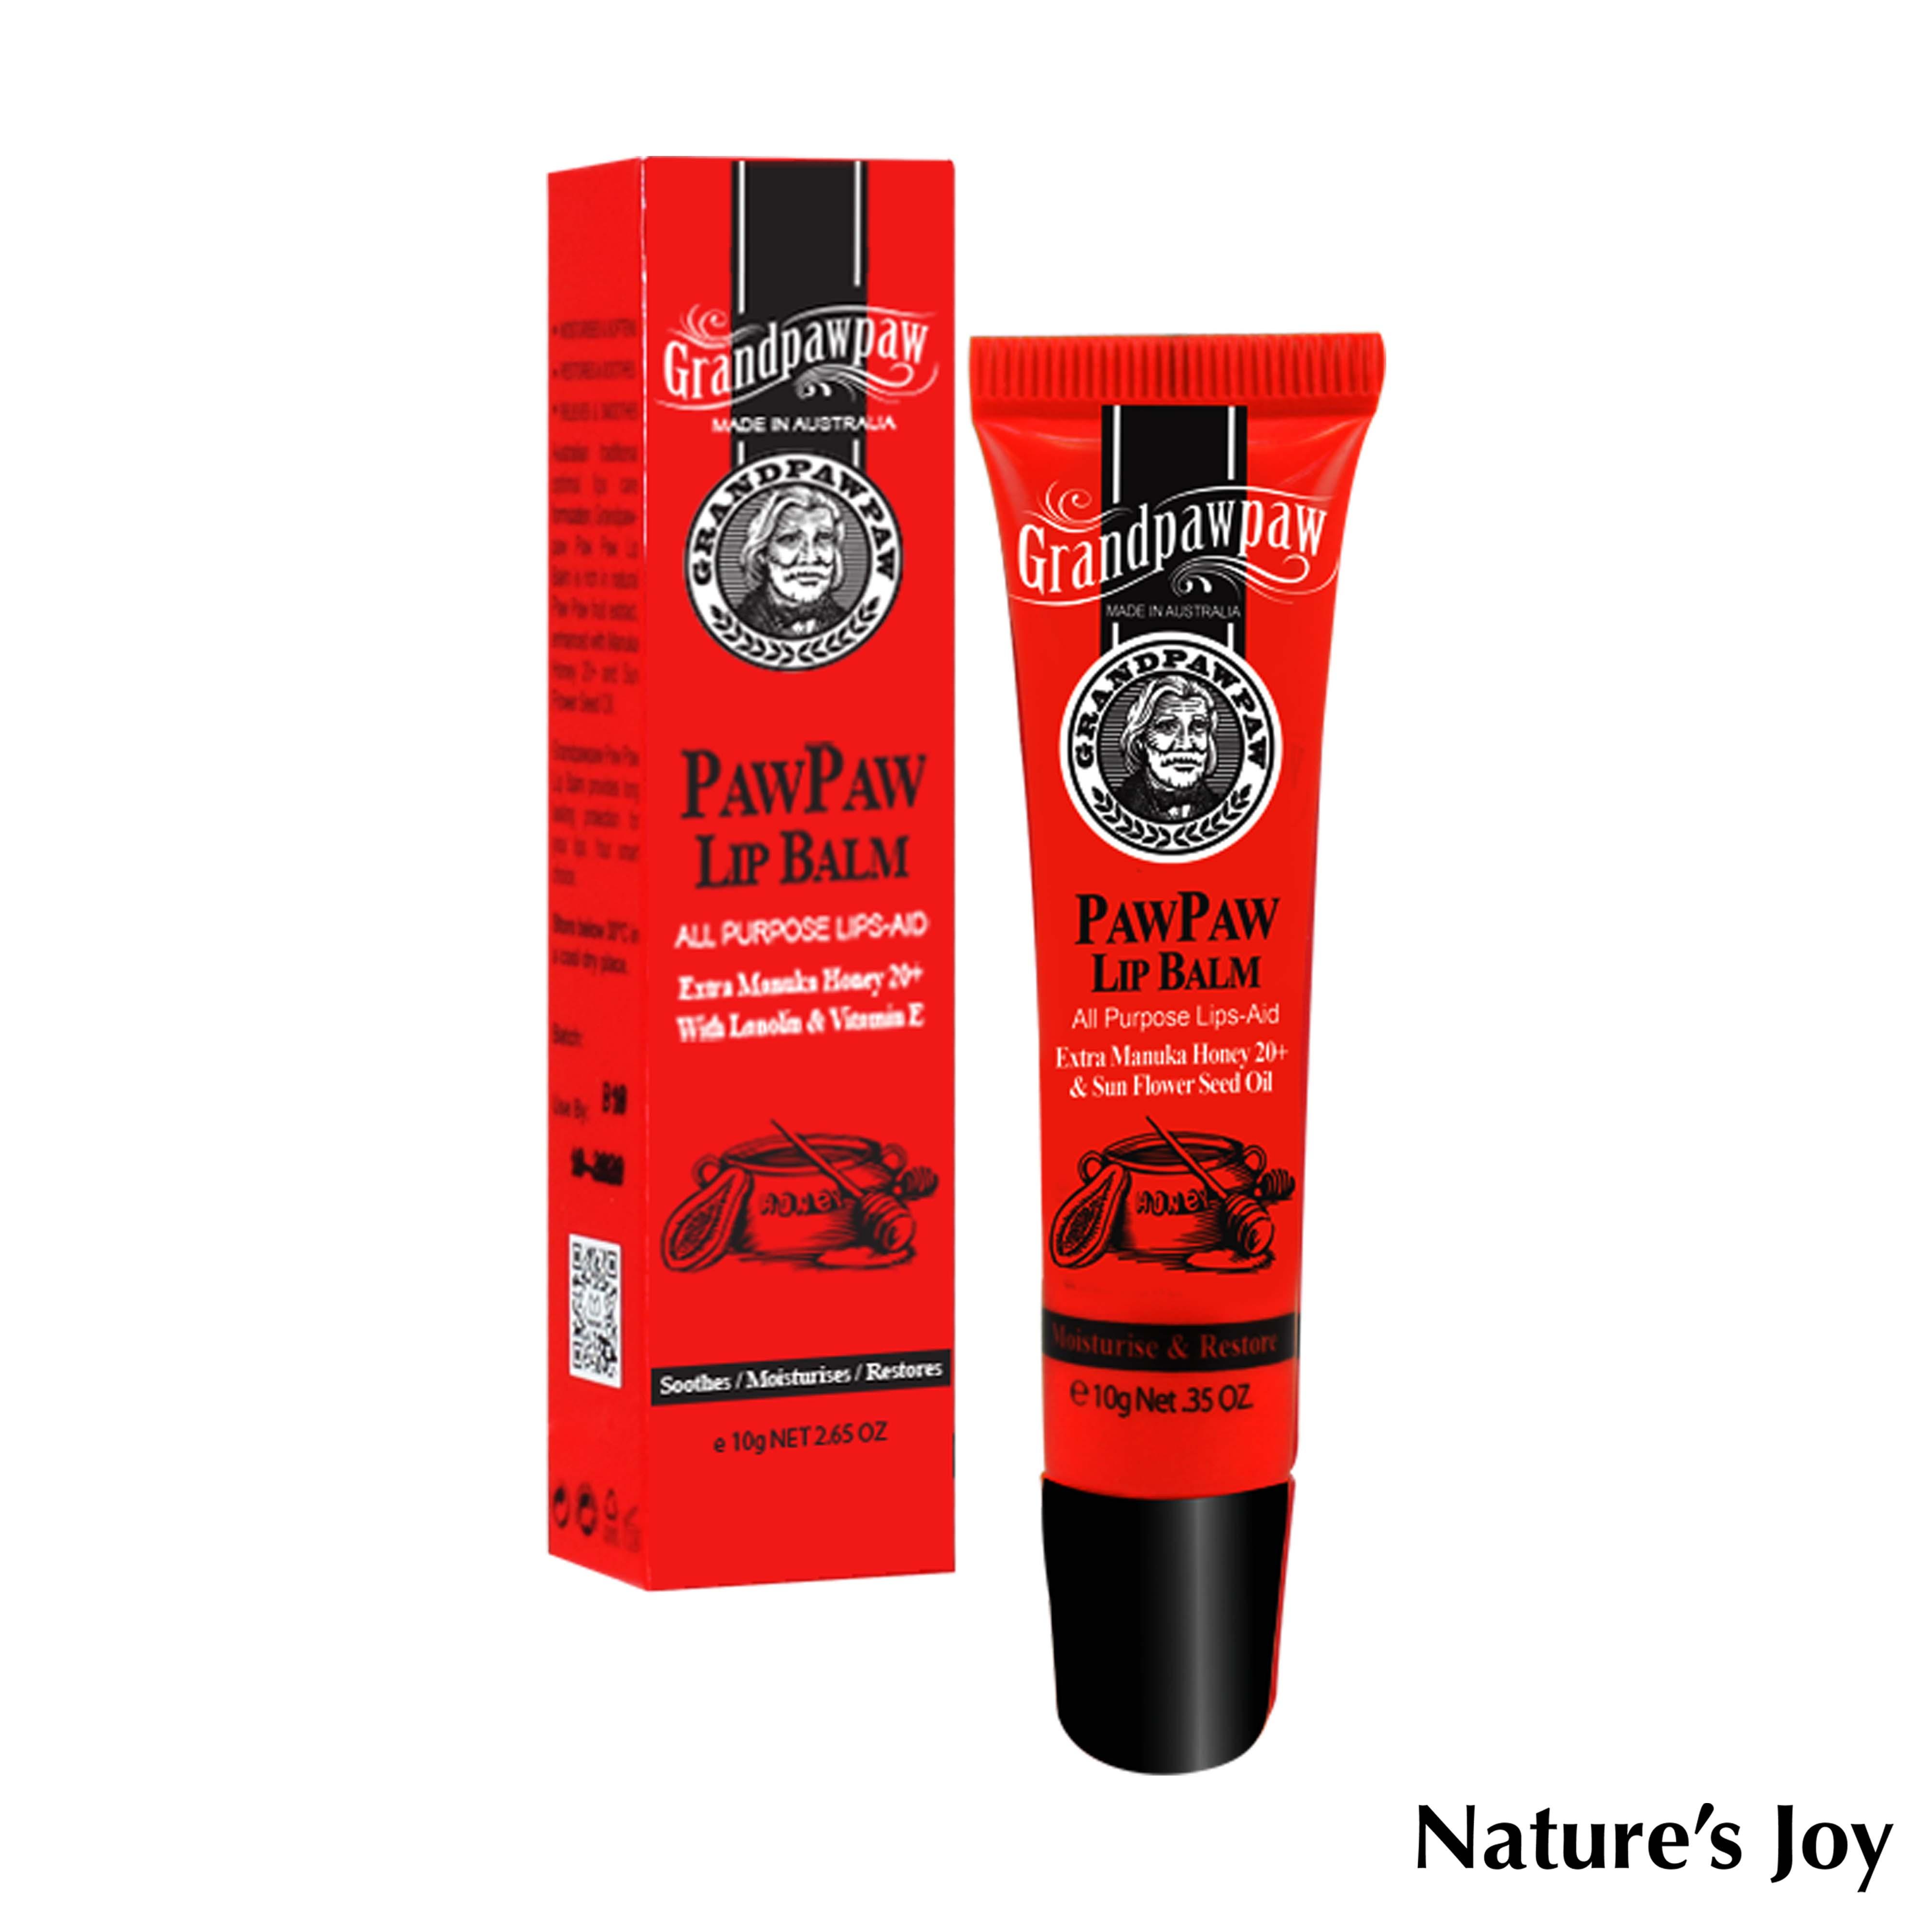 Nature's Joy 木瓜精華修護護唇膏10ml / 幼童可用 / 天然無毒 / 澳洲 / 不含化學成分 0